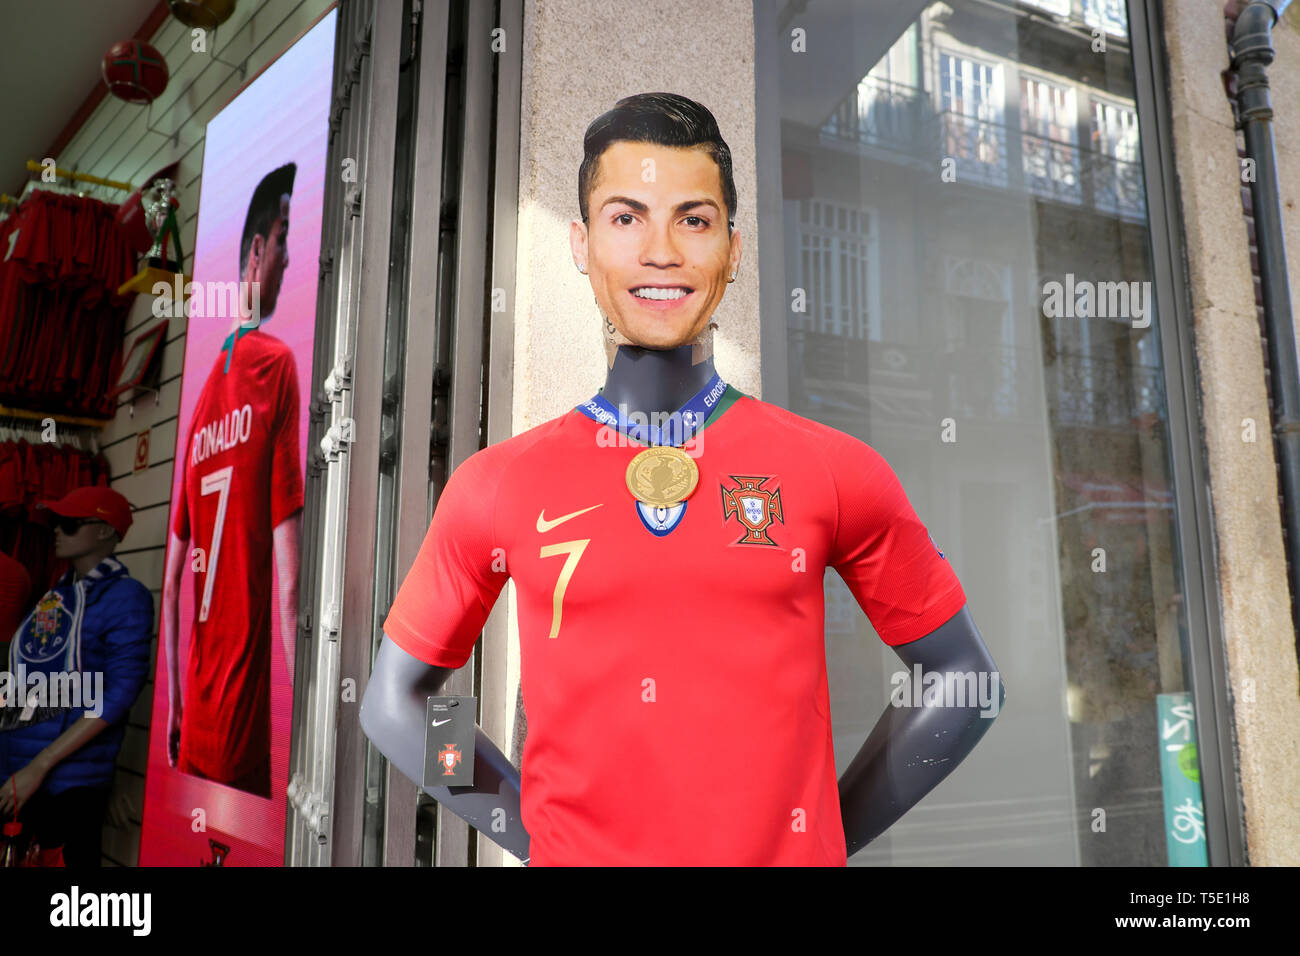 Cristiano Ronaldo Portuguese footballer figure outside a football shop in the city of Porto Portugal Europe KATHY DEWITT - Stock Image